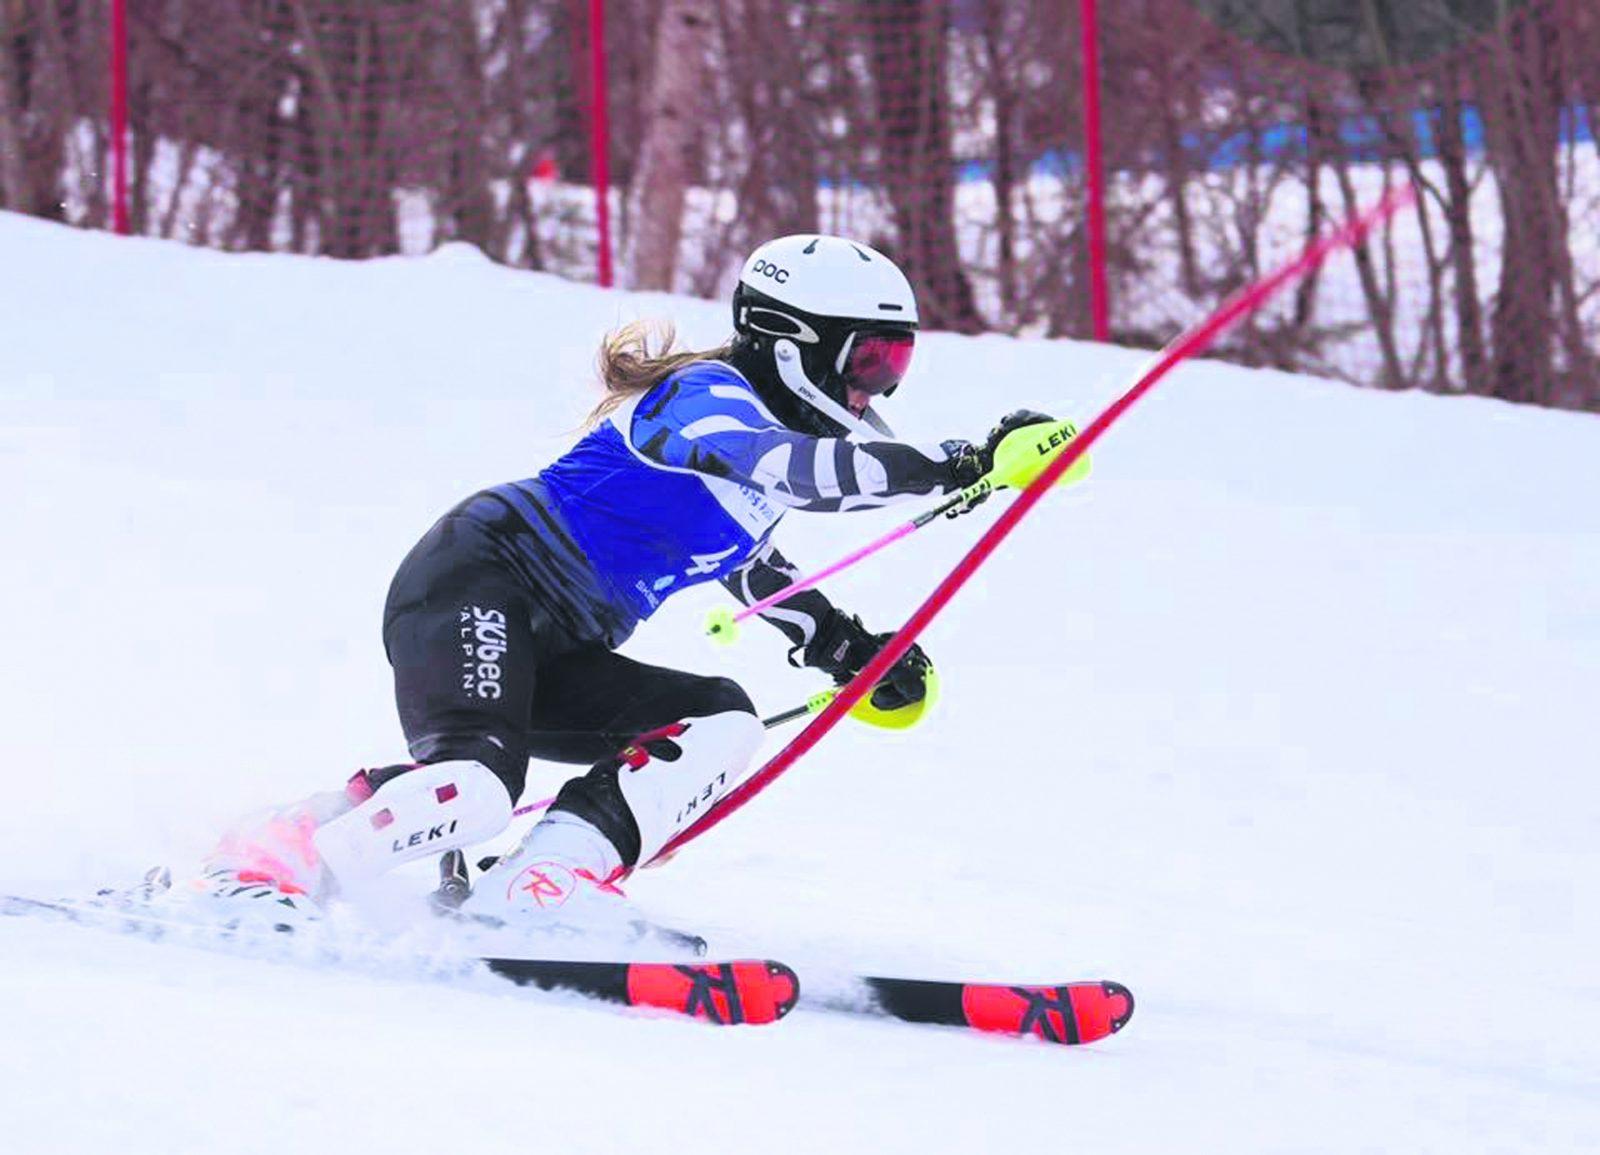 Ski alpin : Megan Heckey ne s'ennuie pas